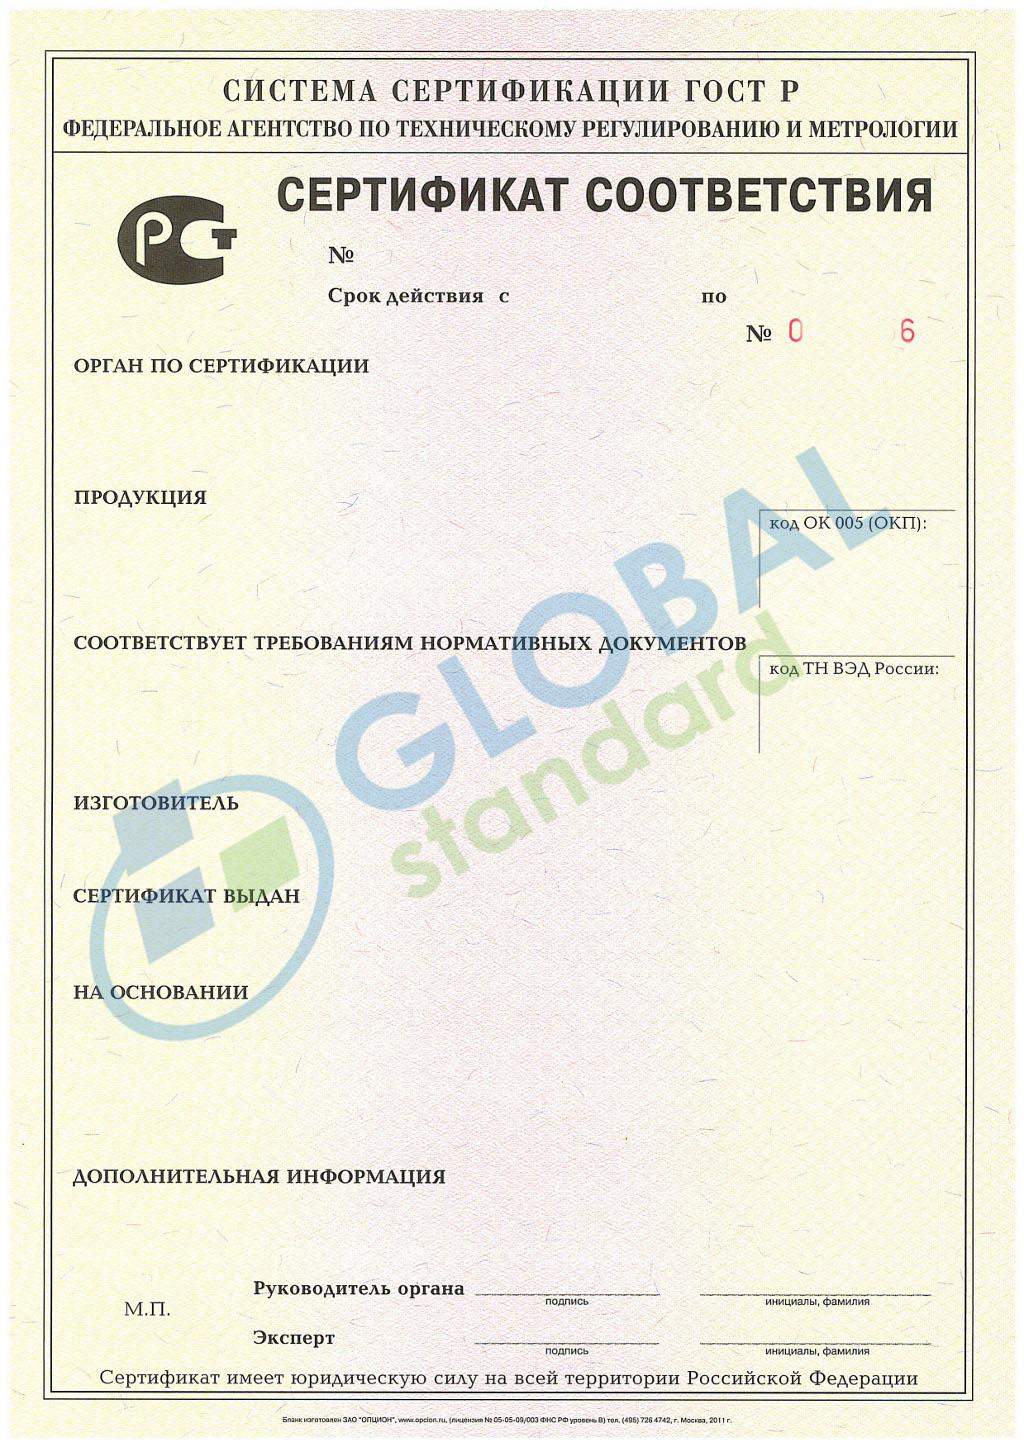 http://g-standard.ru/content/obyazatelniy-sertifikat-gost-r